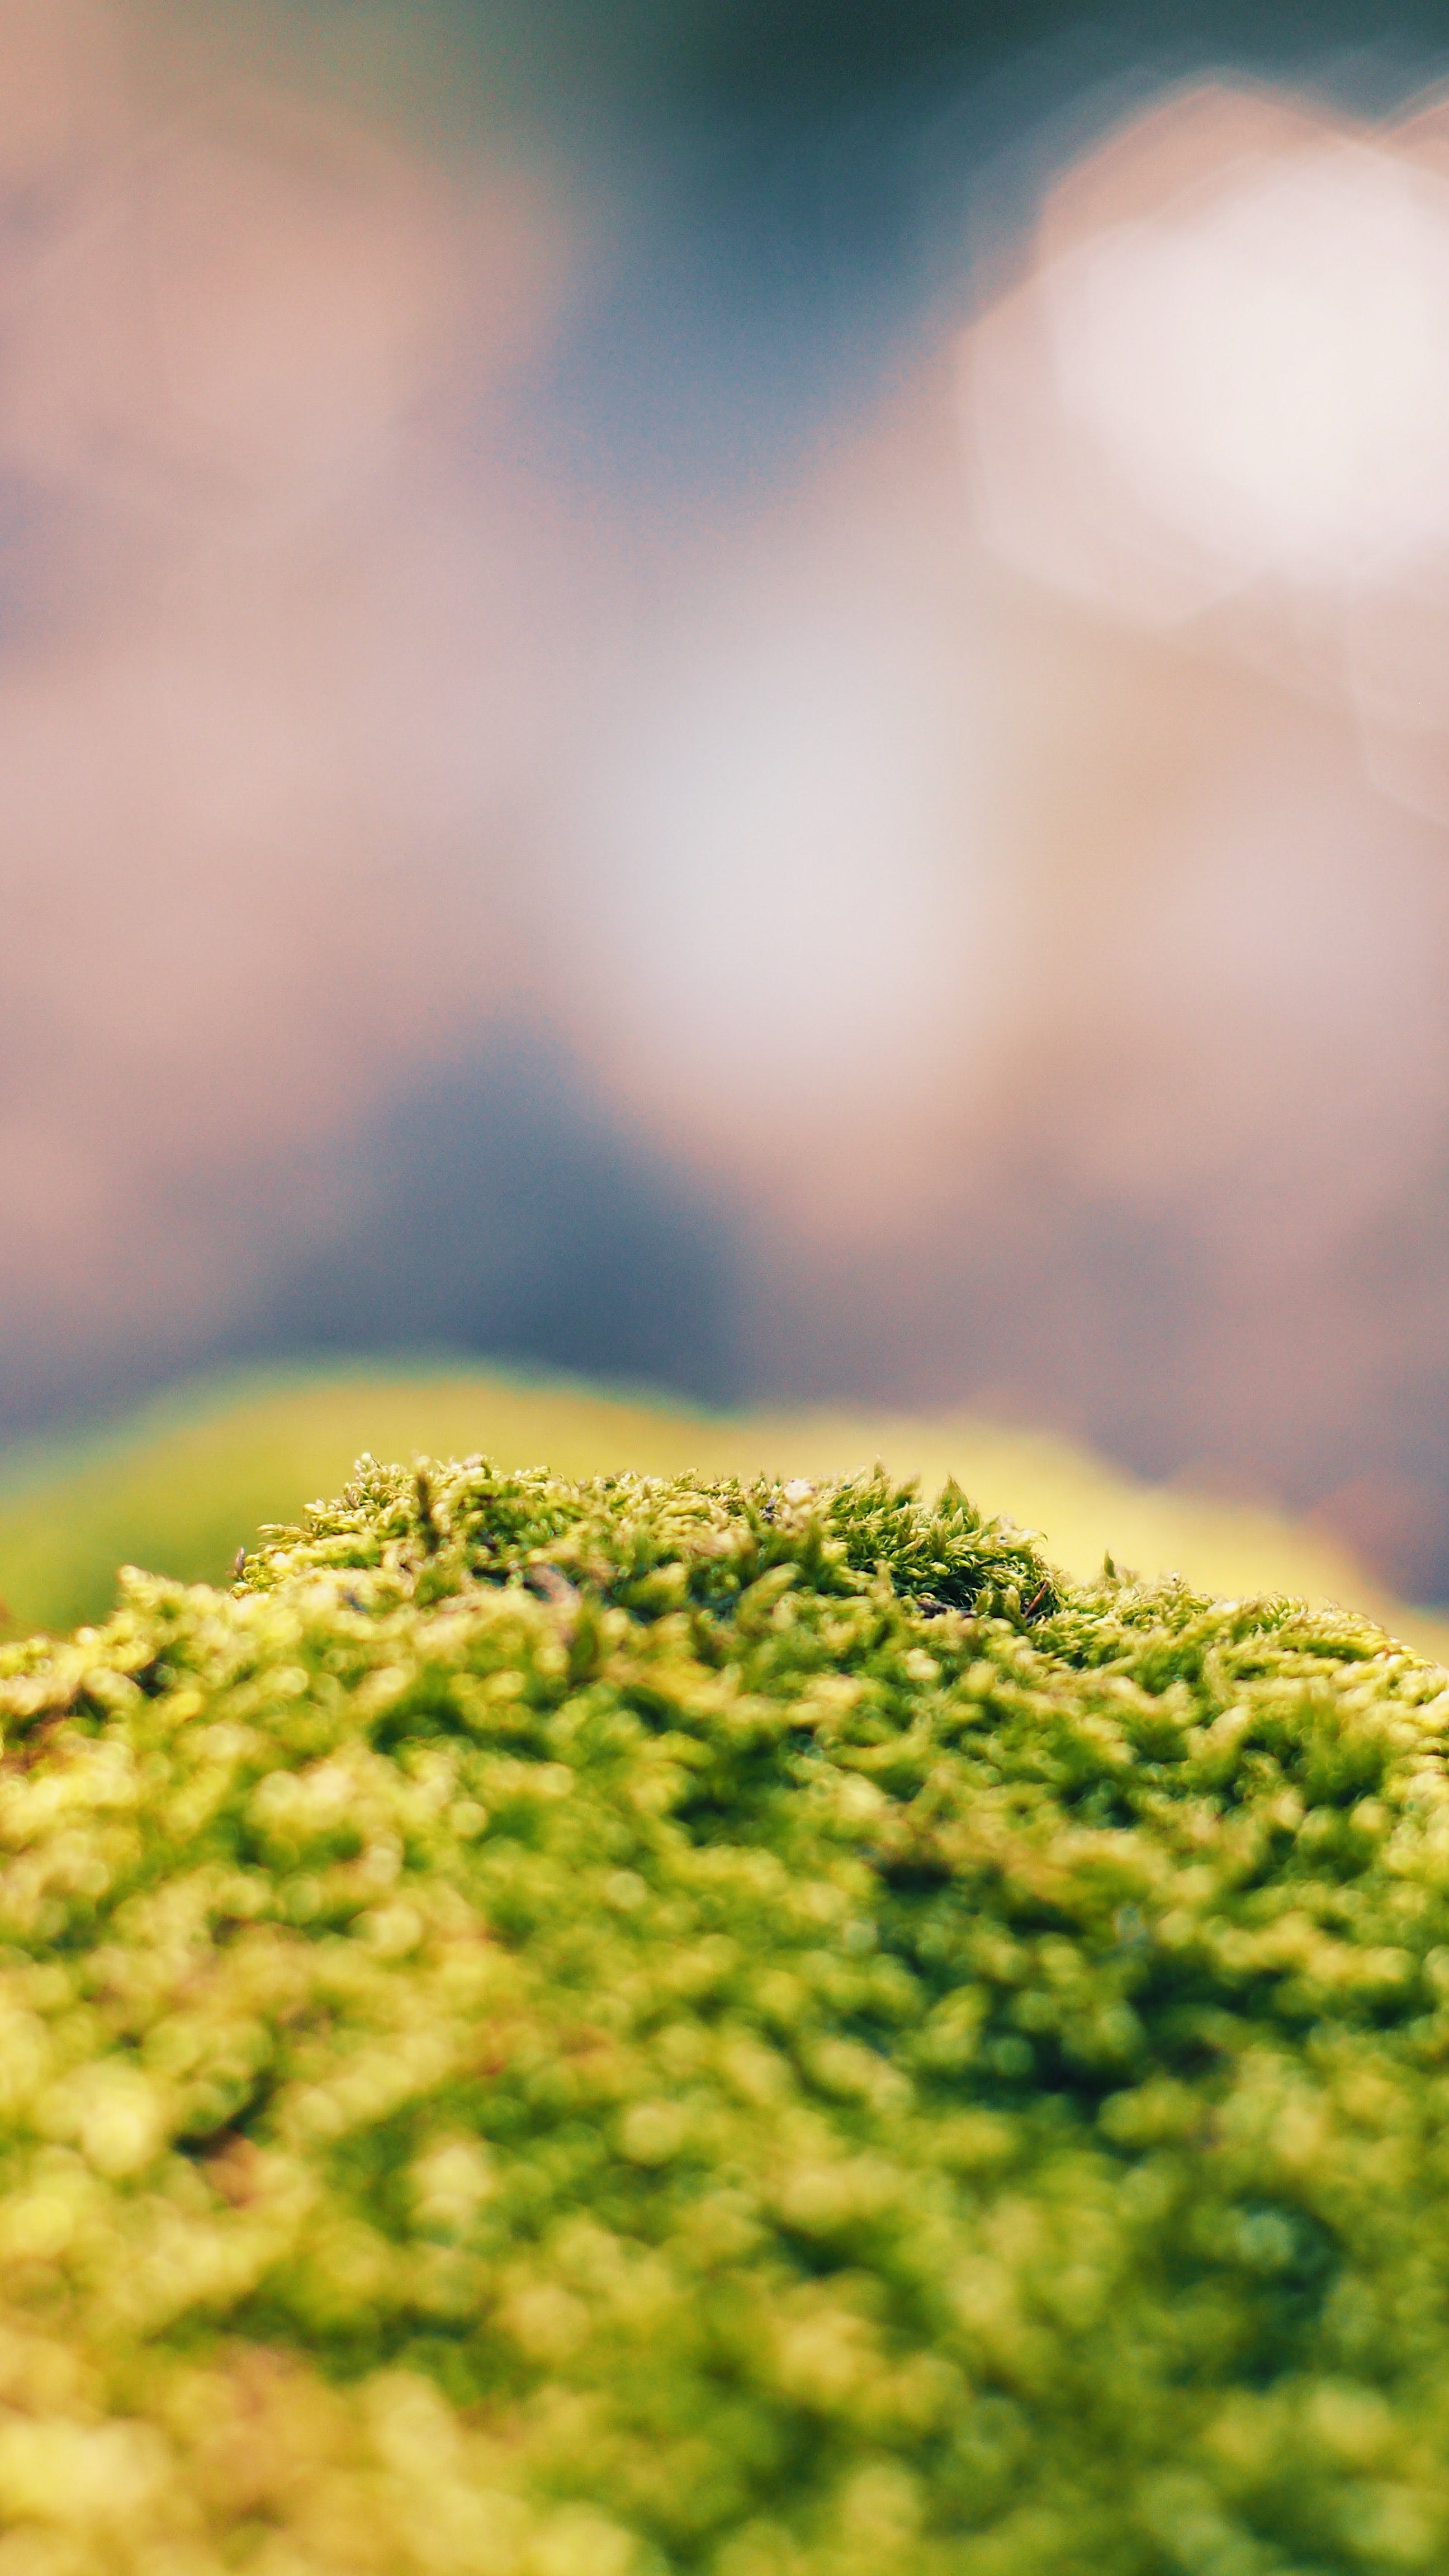 Close-up Photo of Green Algae